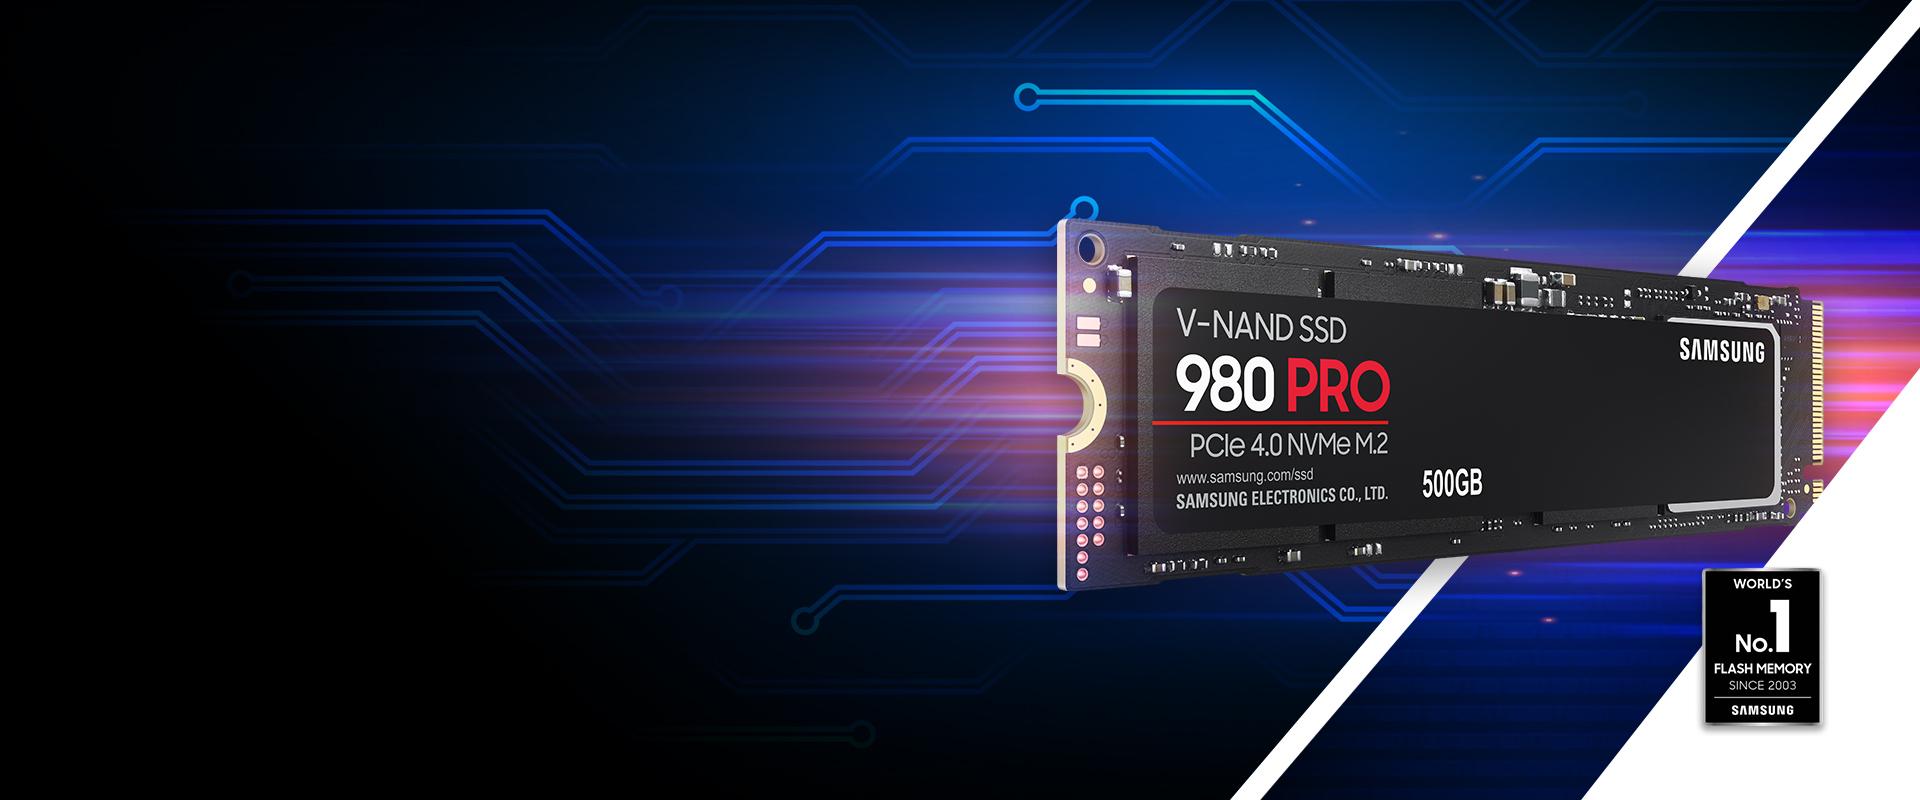 Samsung 980 PRO SSD